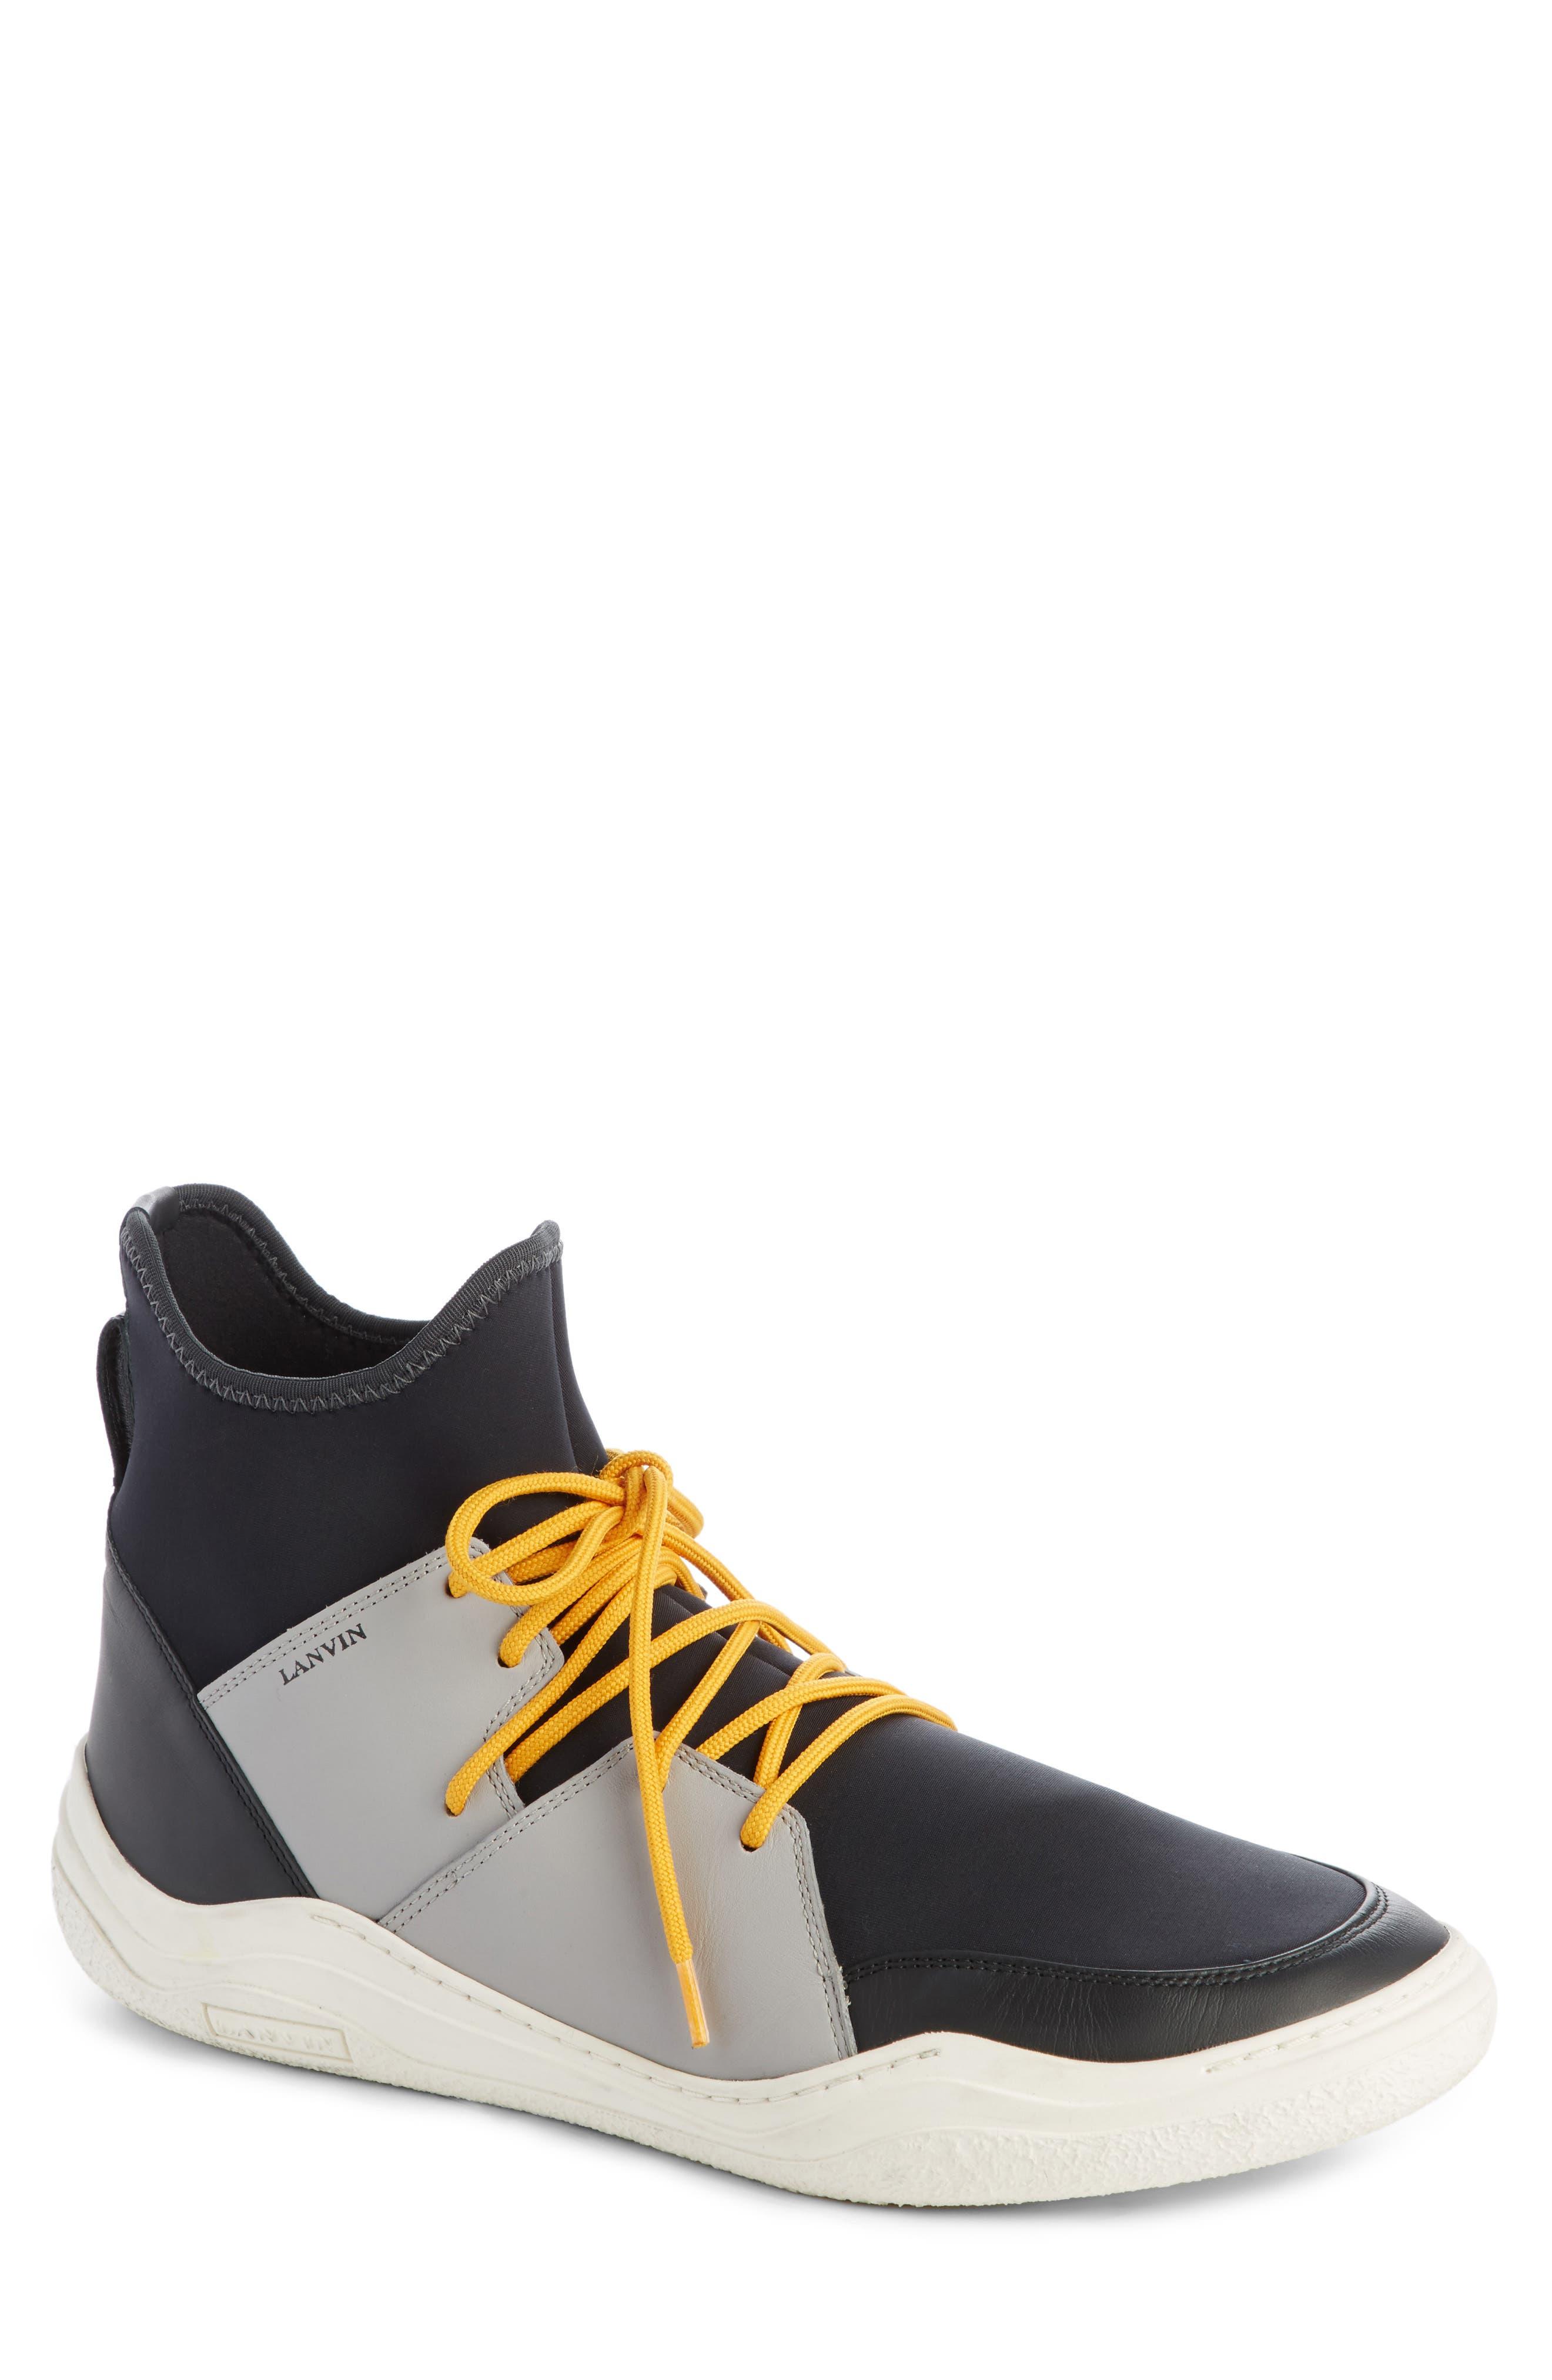 High Top Sneaker,                             Main thumbnail 1, color,                             001